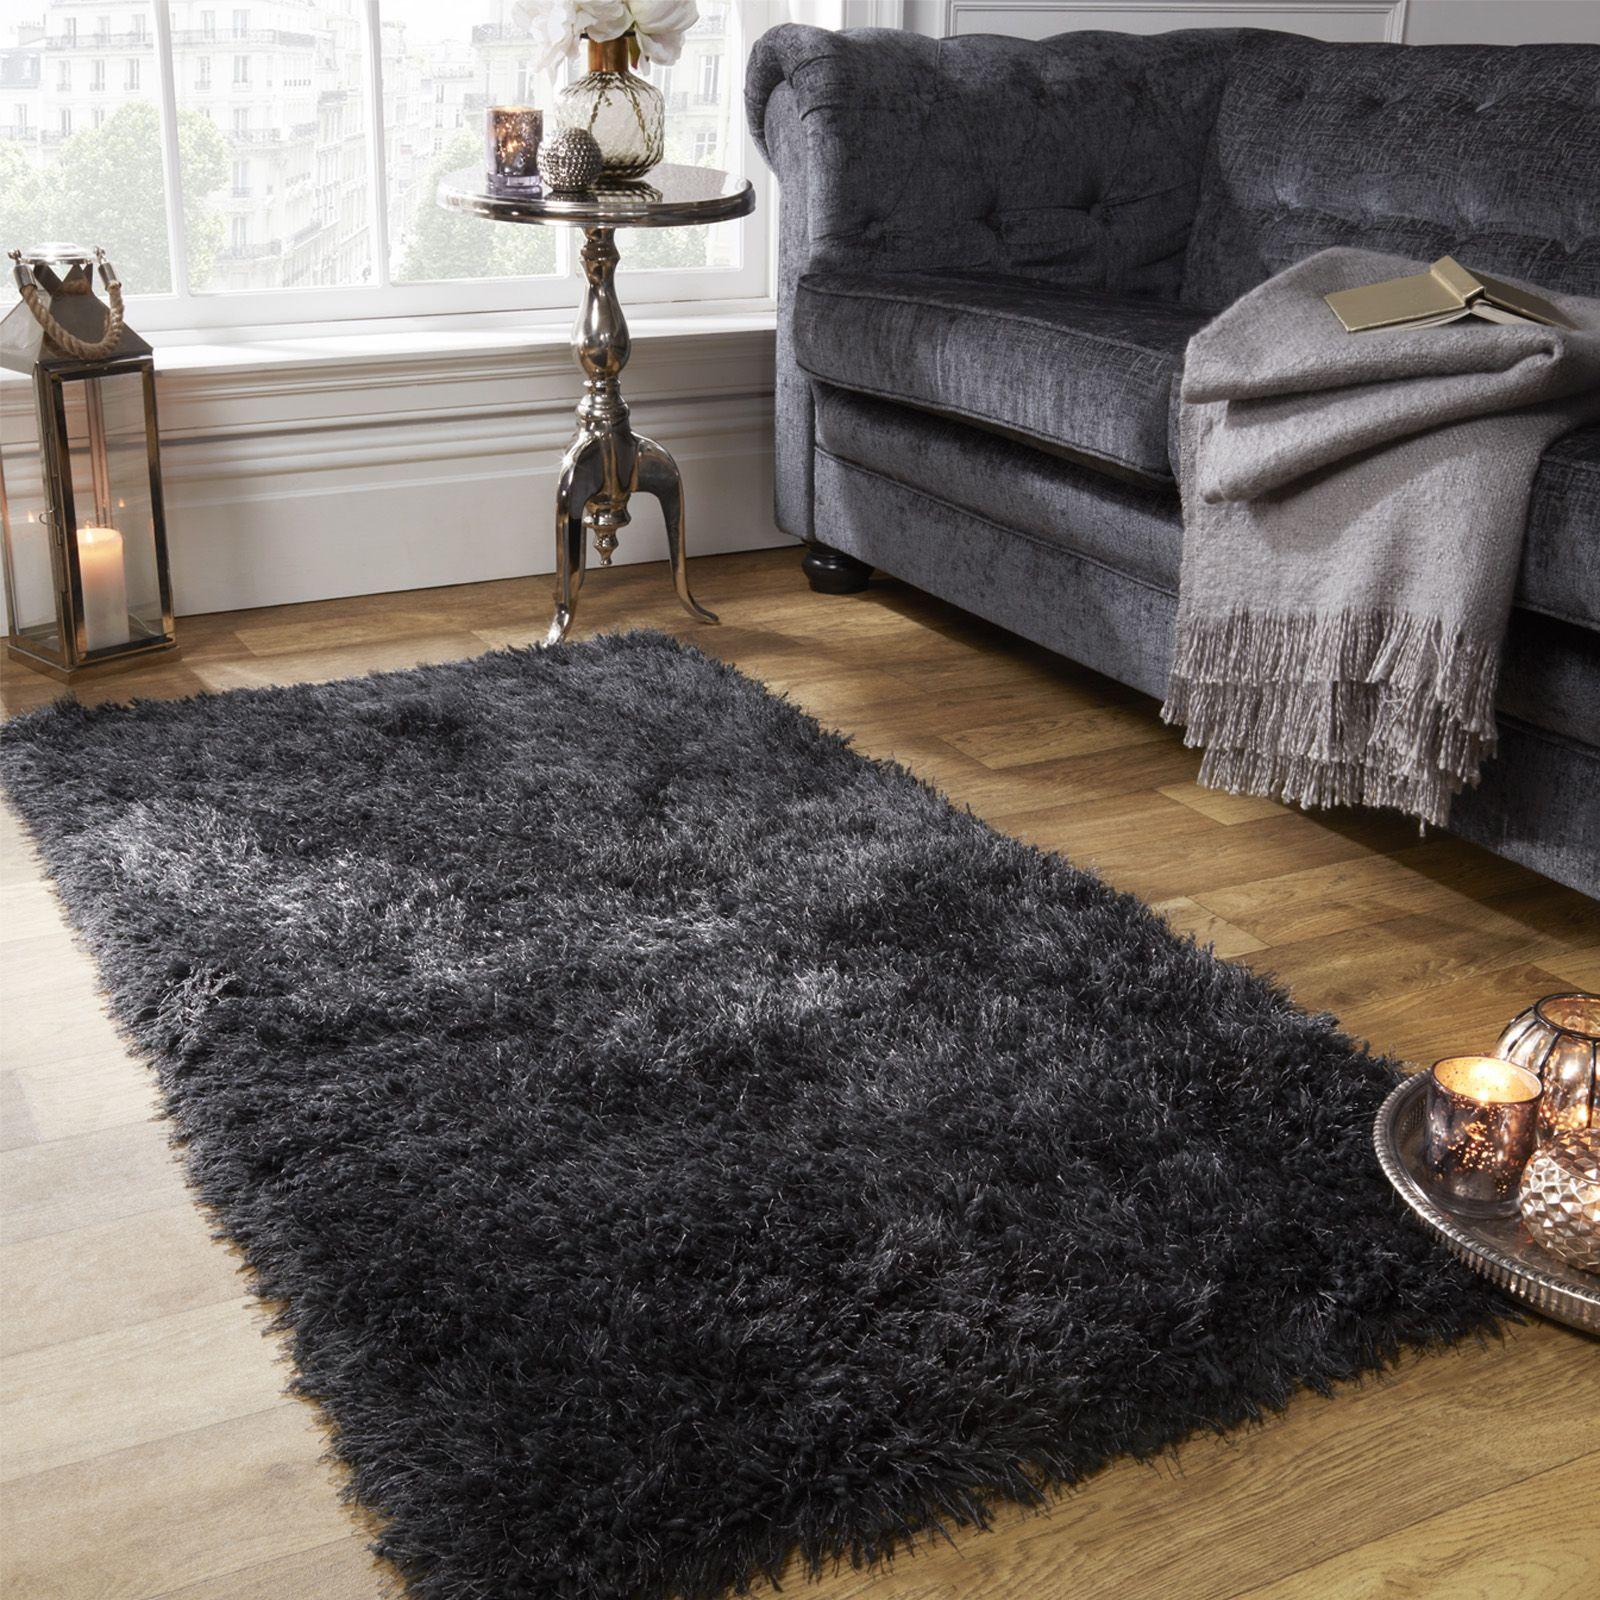 Shaggy Floor Carpet Area Mat 5cm